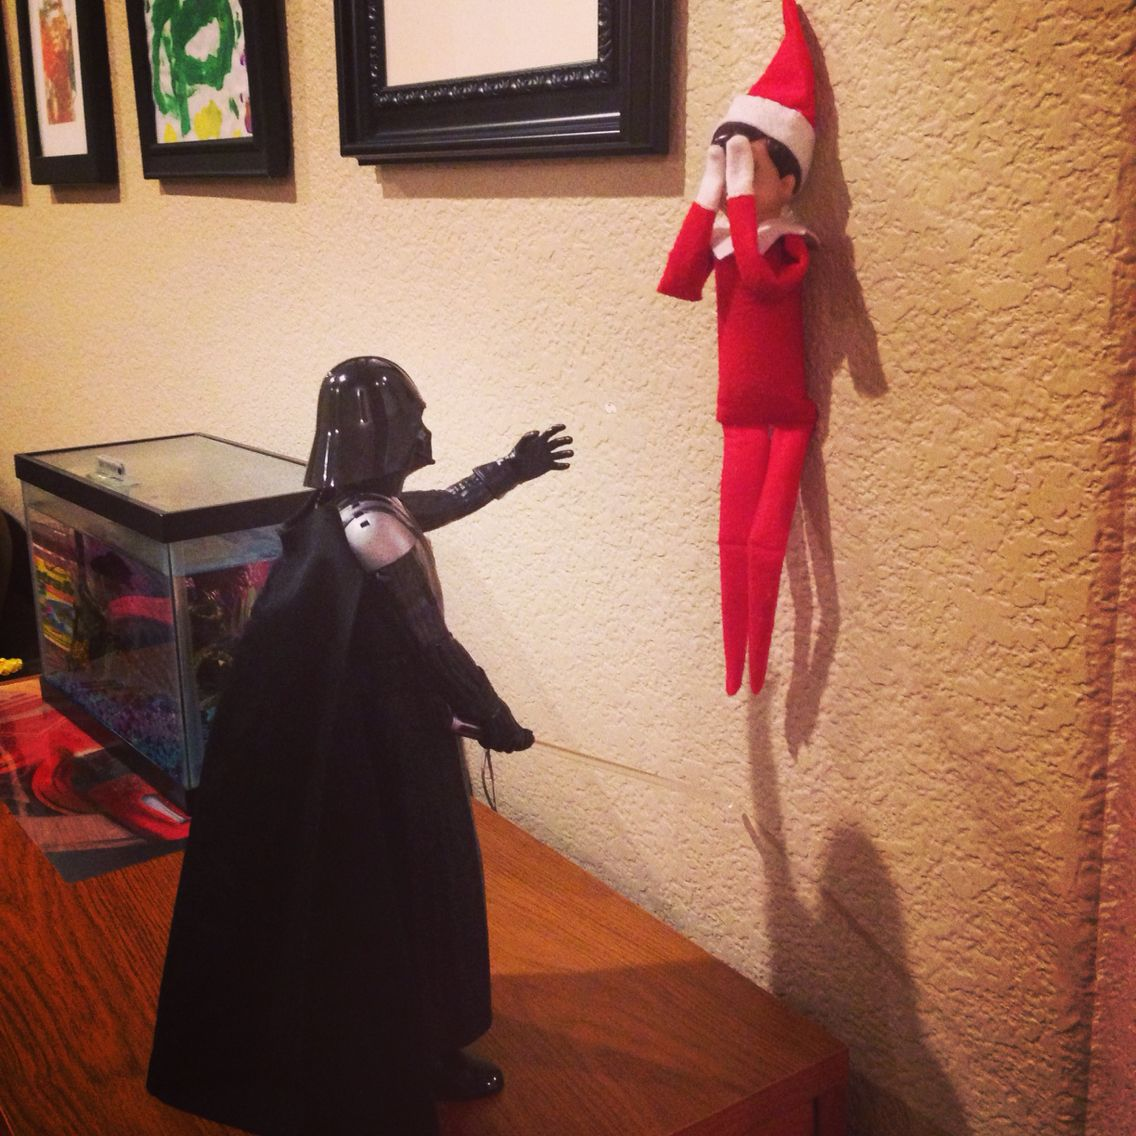 No Darth Vader......Elfie will not join the Dark Side. Elf on the ...